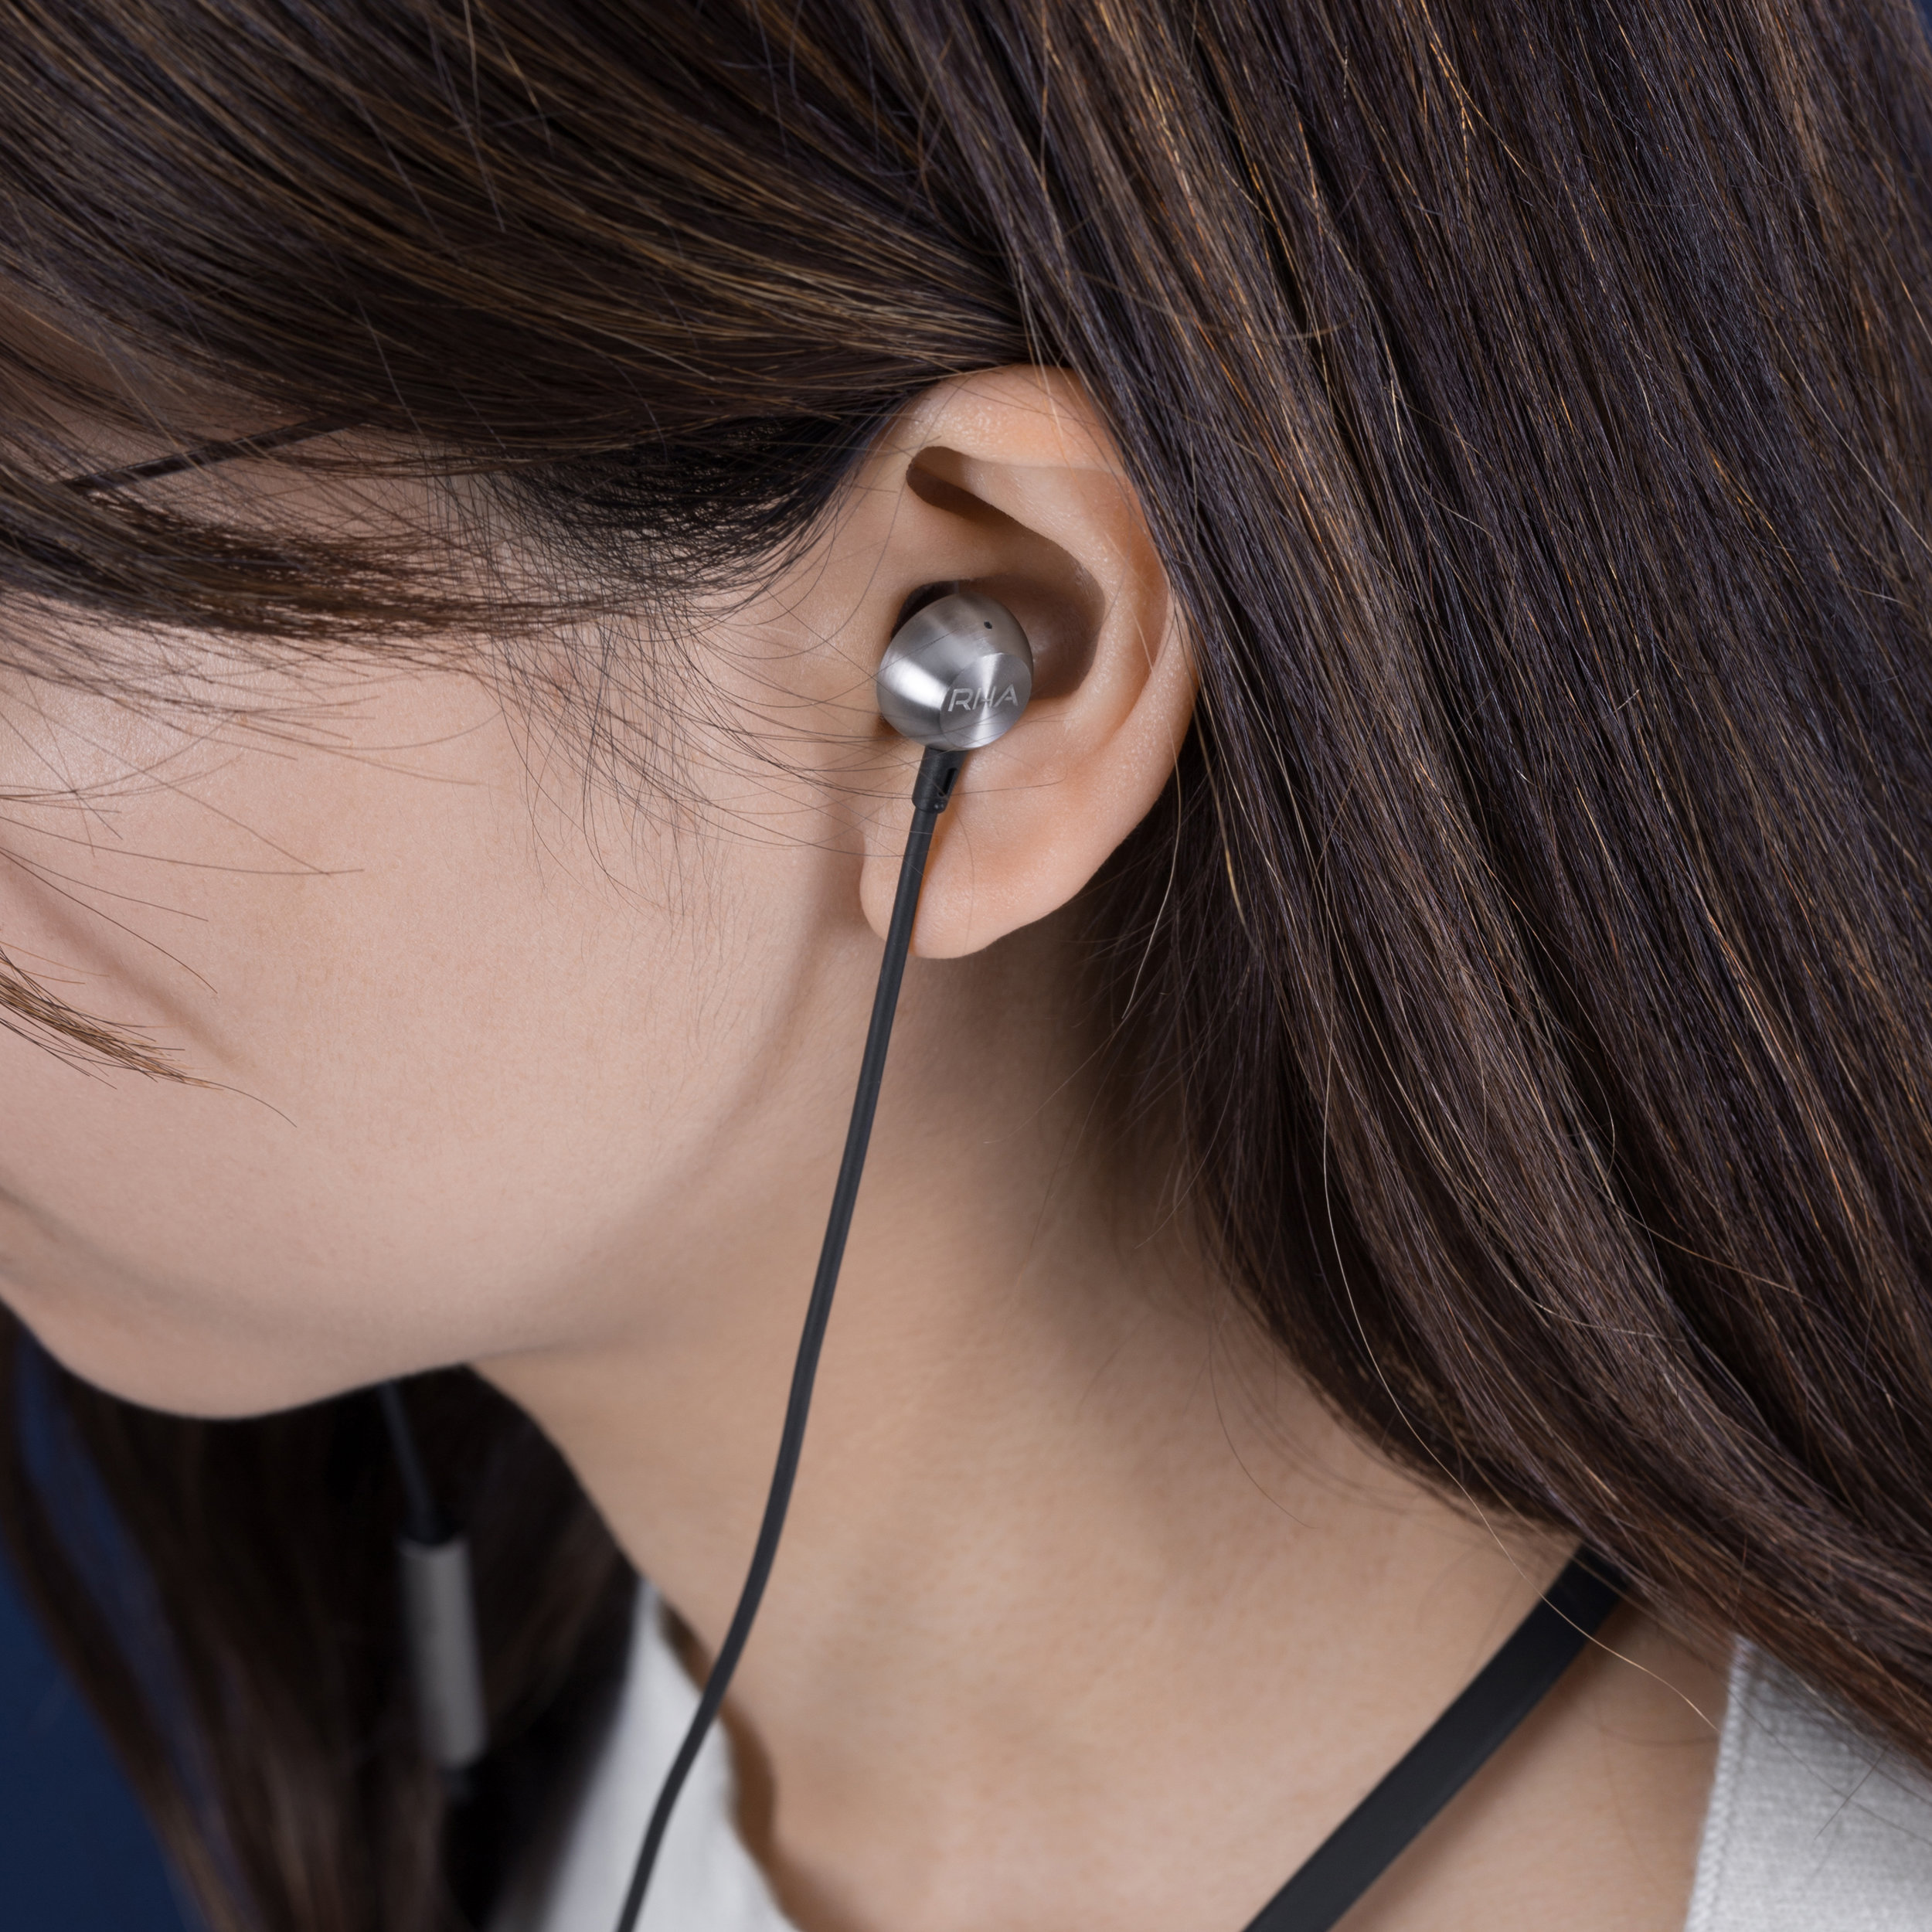 Thumb_ 6. MA650 Wireless - Lifestyle 4.jpg